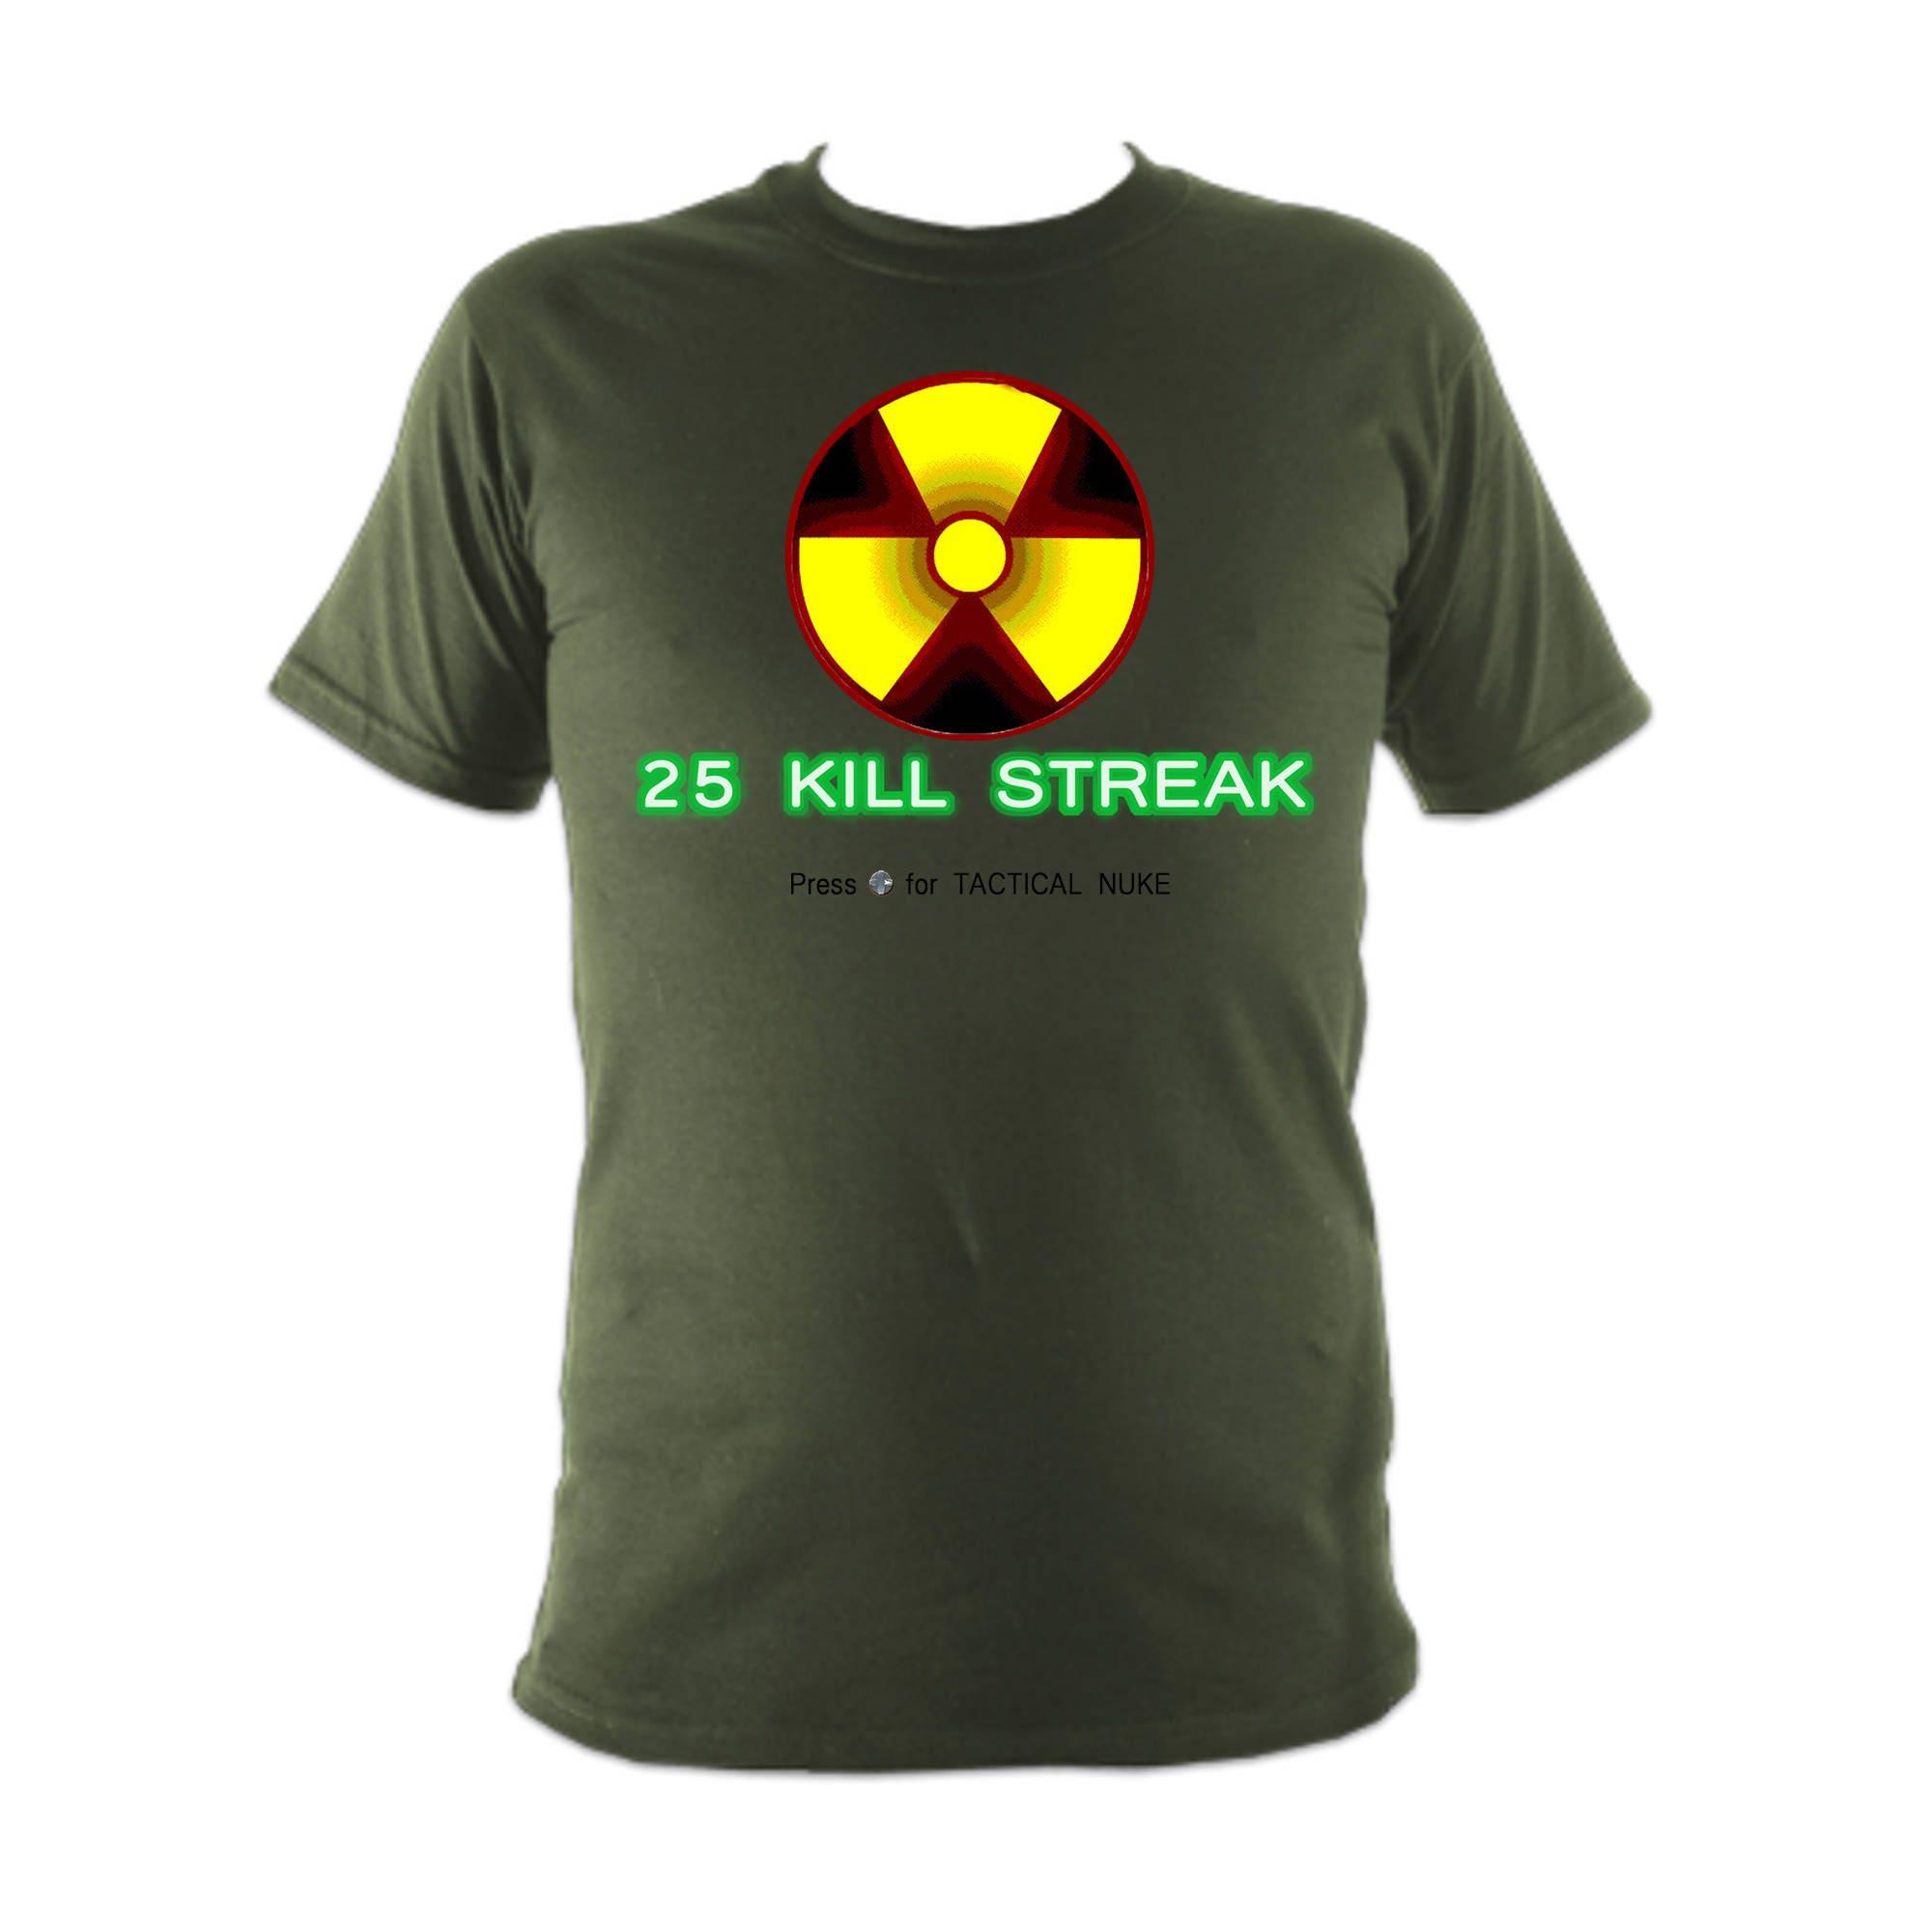 NUKE of TACTIQUE | Call of NUKE Duty Modern Warfare 2 chemise 8fd4f3